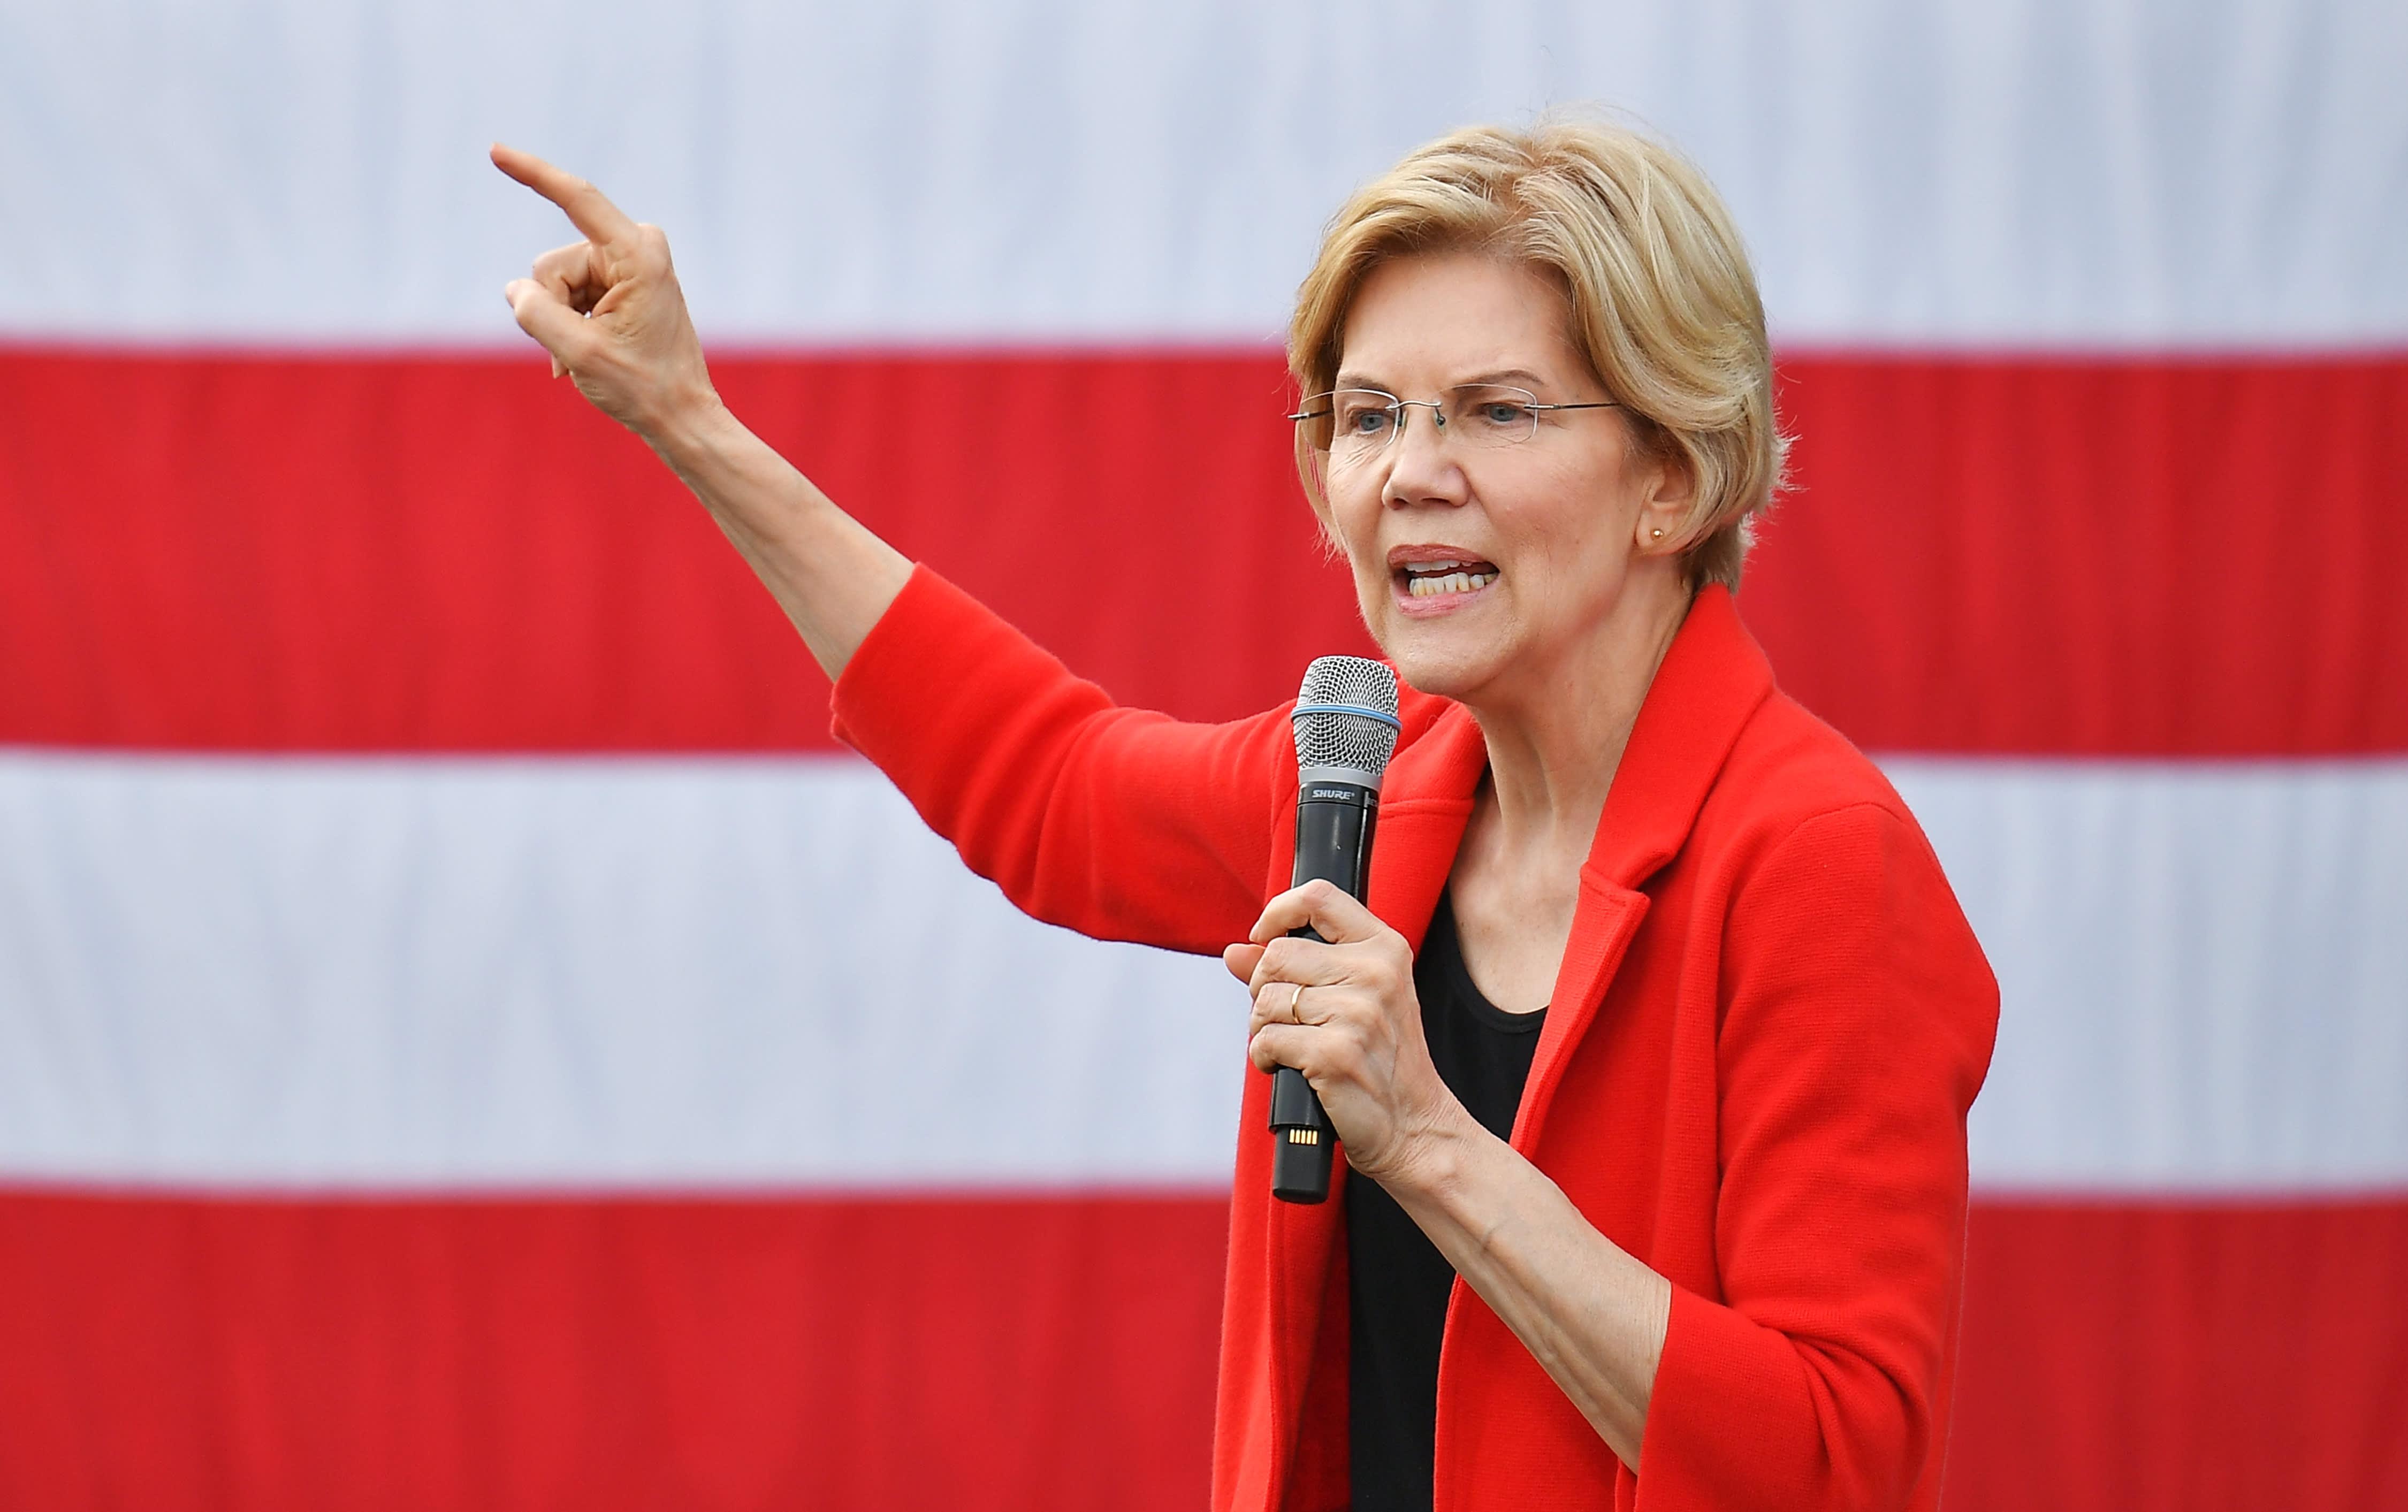 'Economic patriotism' — Elizabeth Warren calls for aggressive market intervention in jobs plan